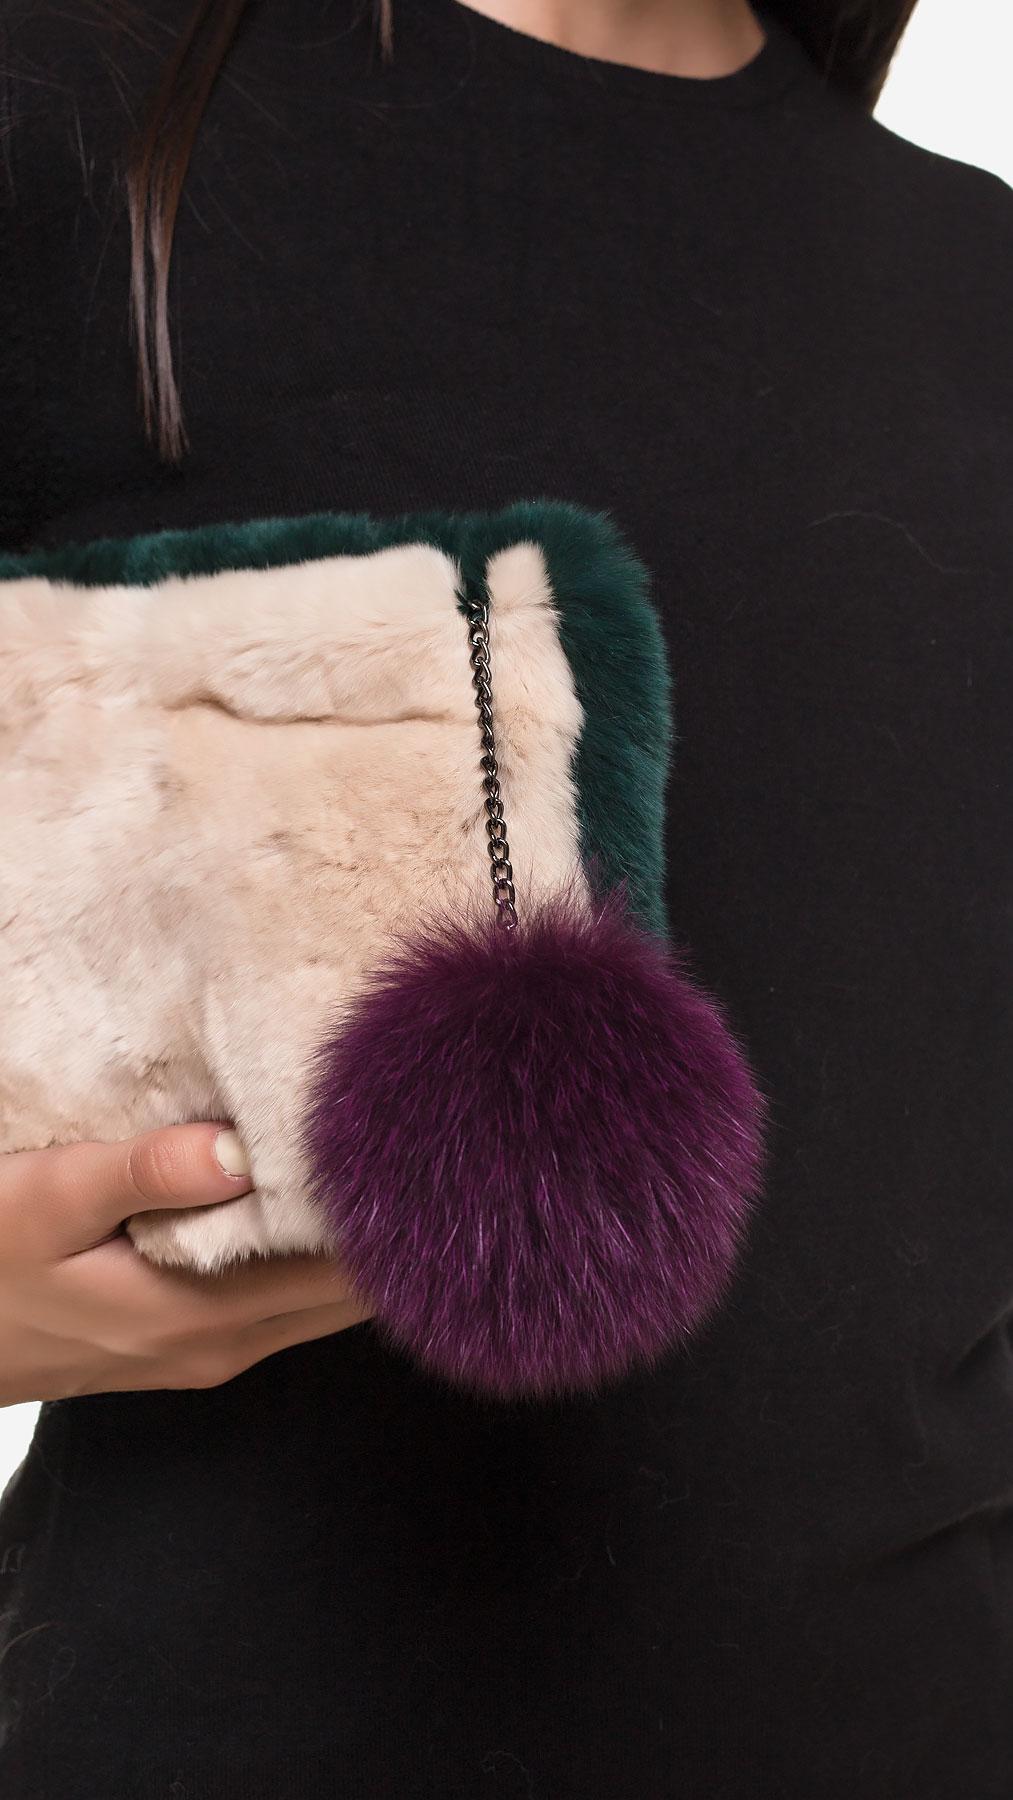 c01f49dad2 ΓΟΥΝΙΝΗ ΤΣΑΝΤΑ - Muse Furs